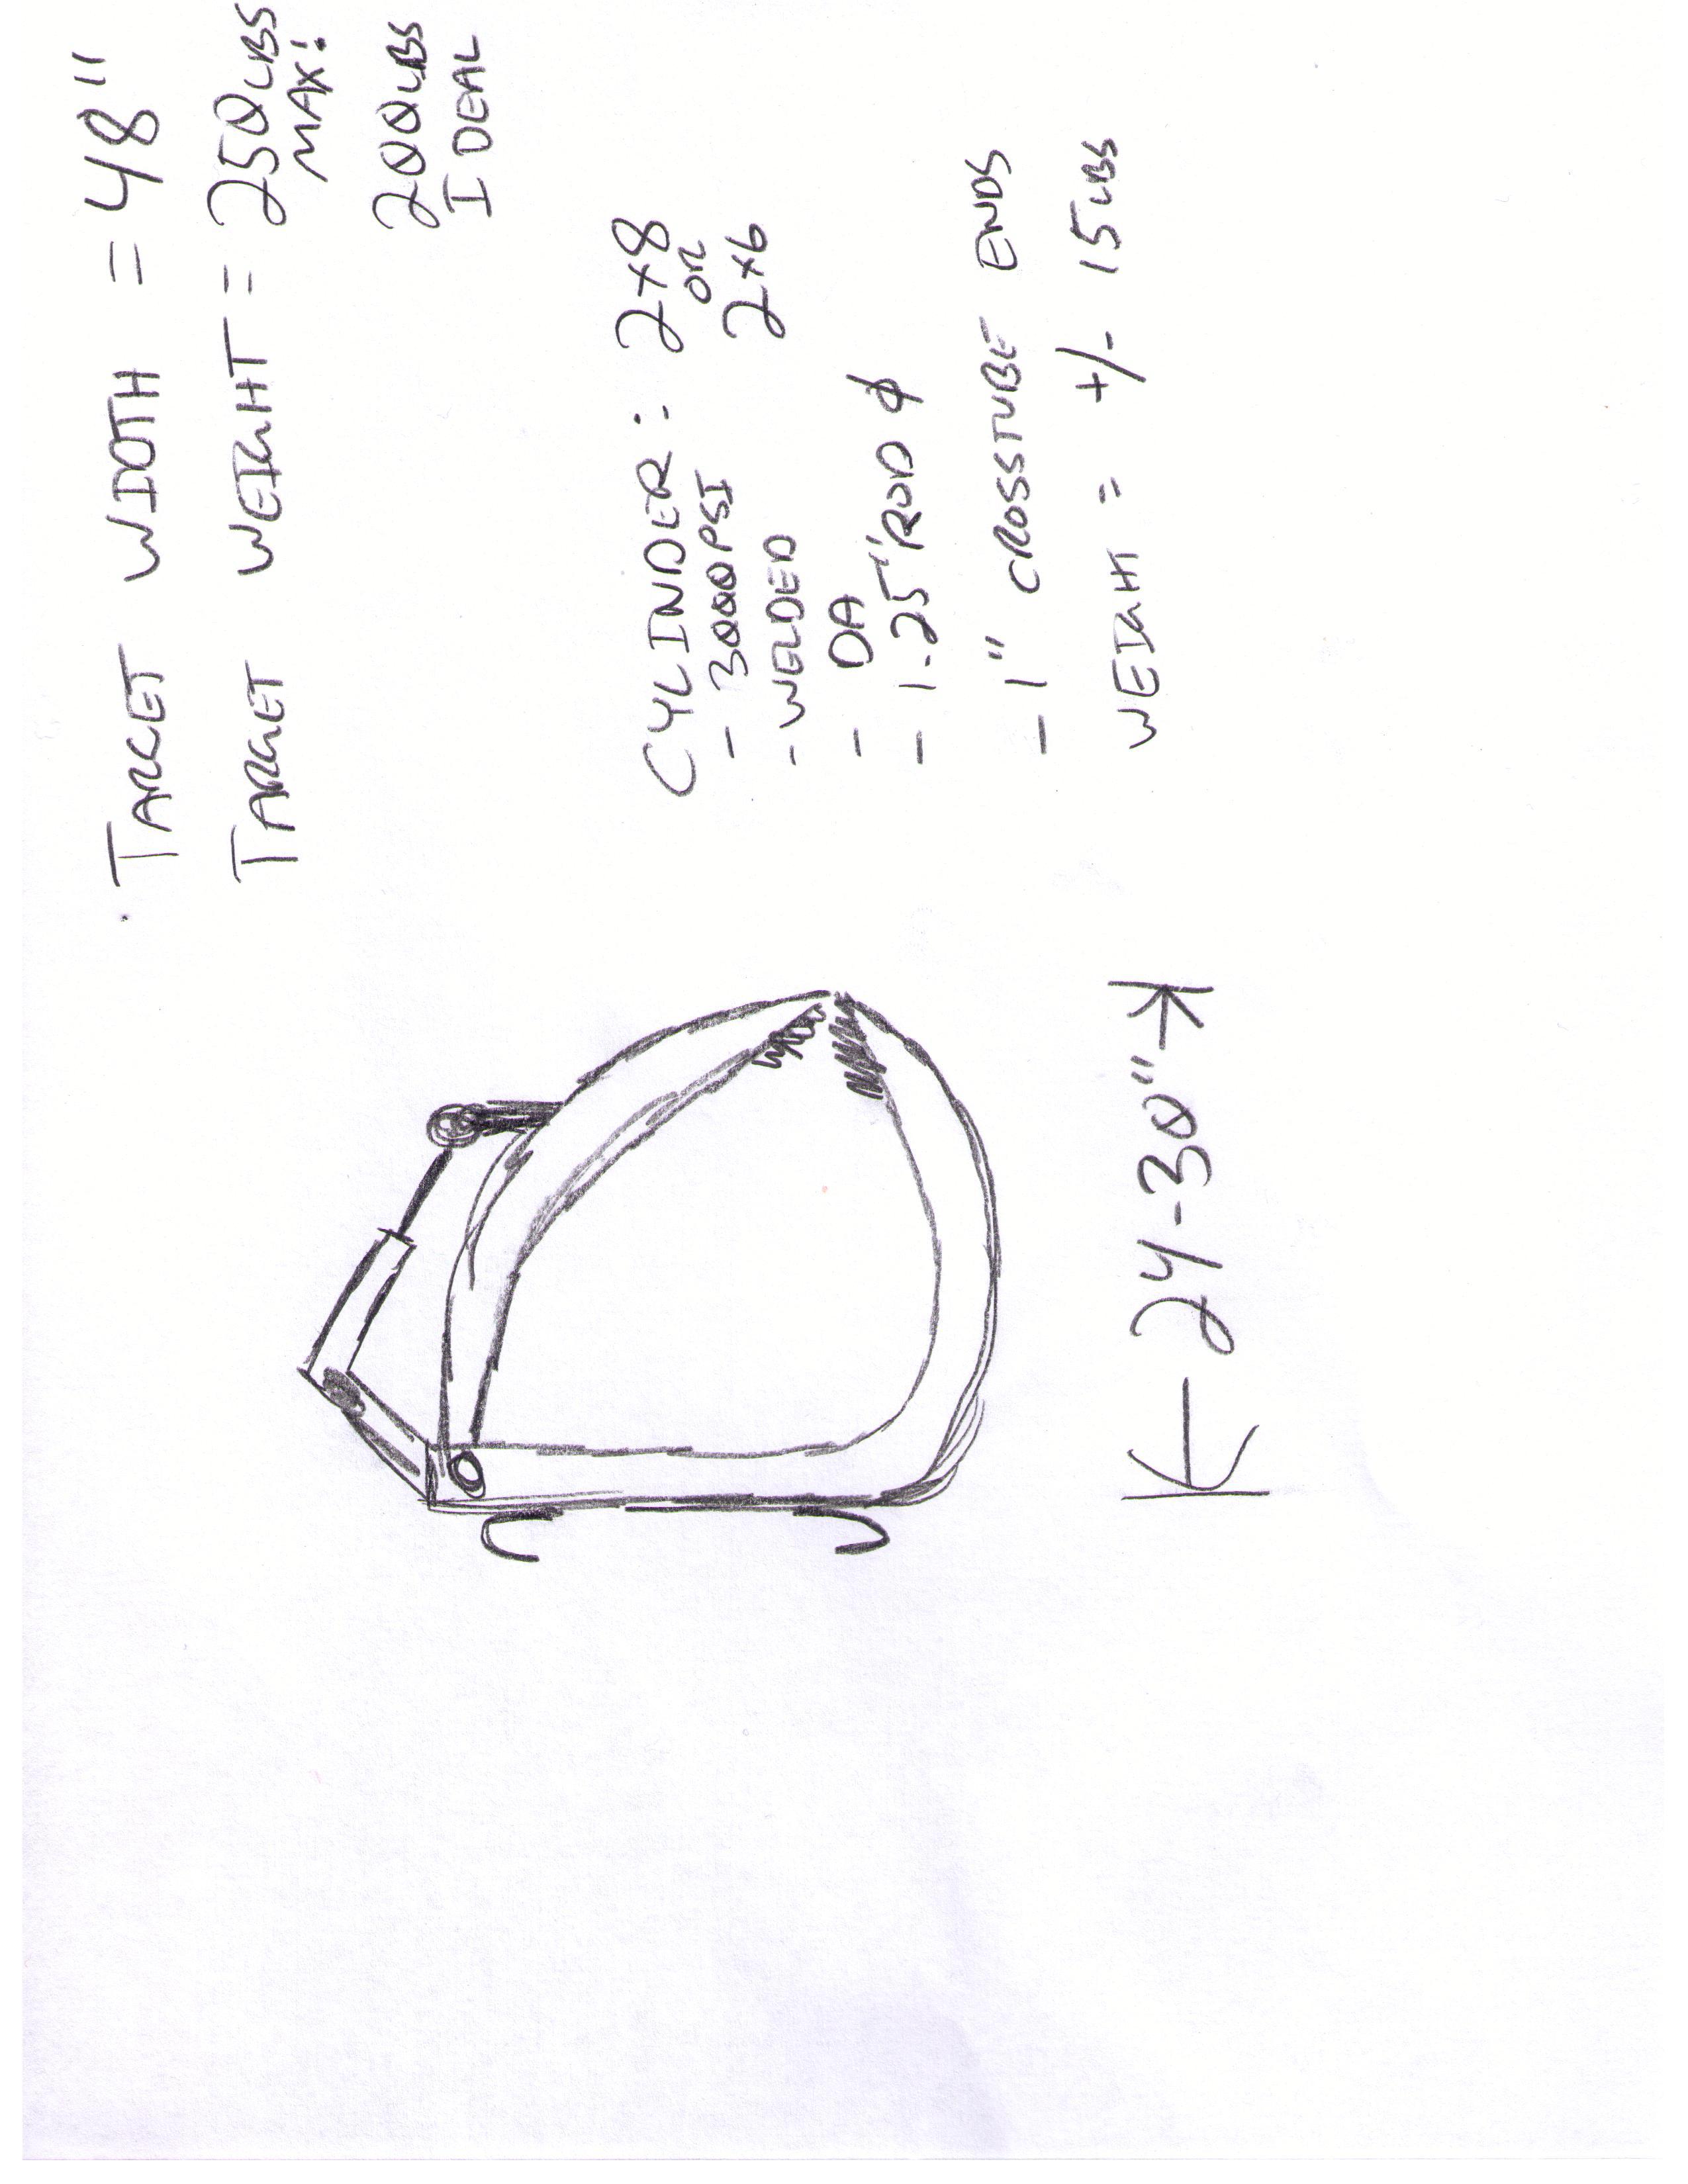 Grapple Sketch V1.JPG